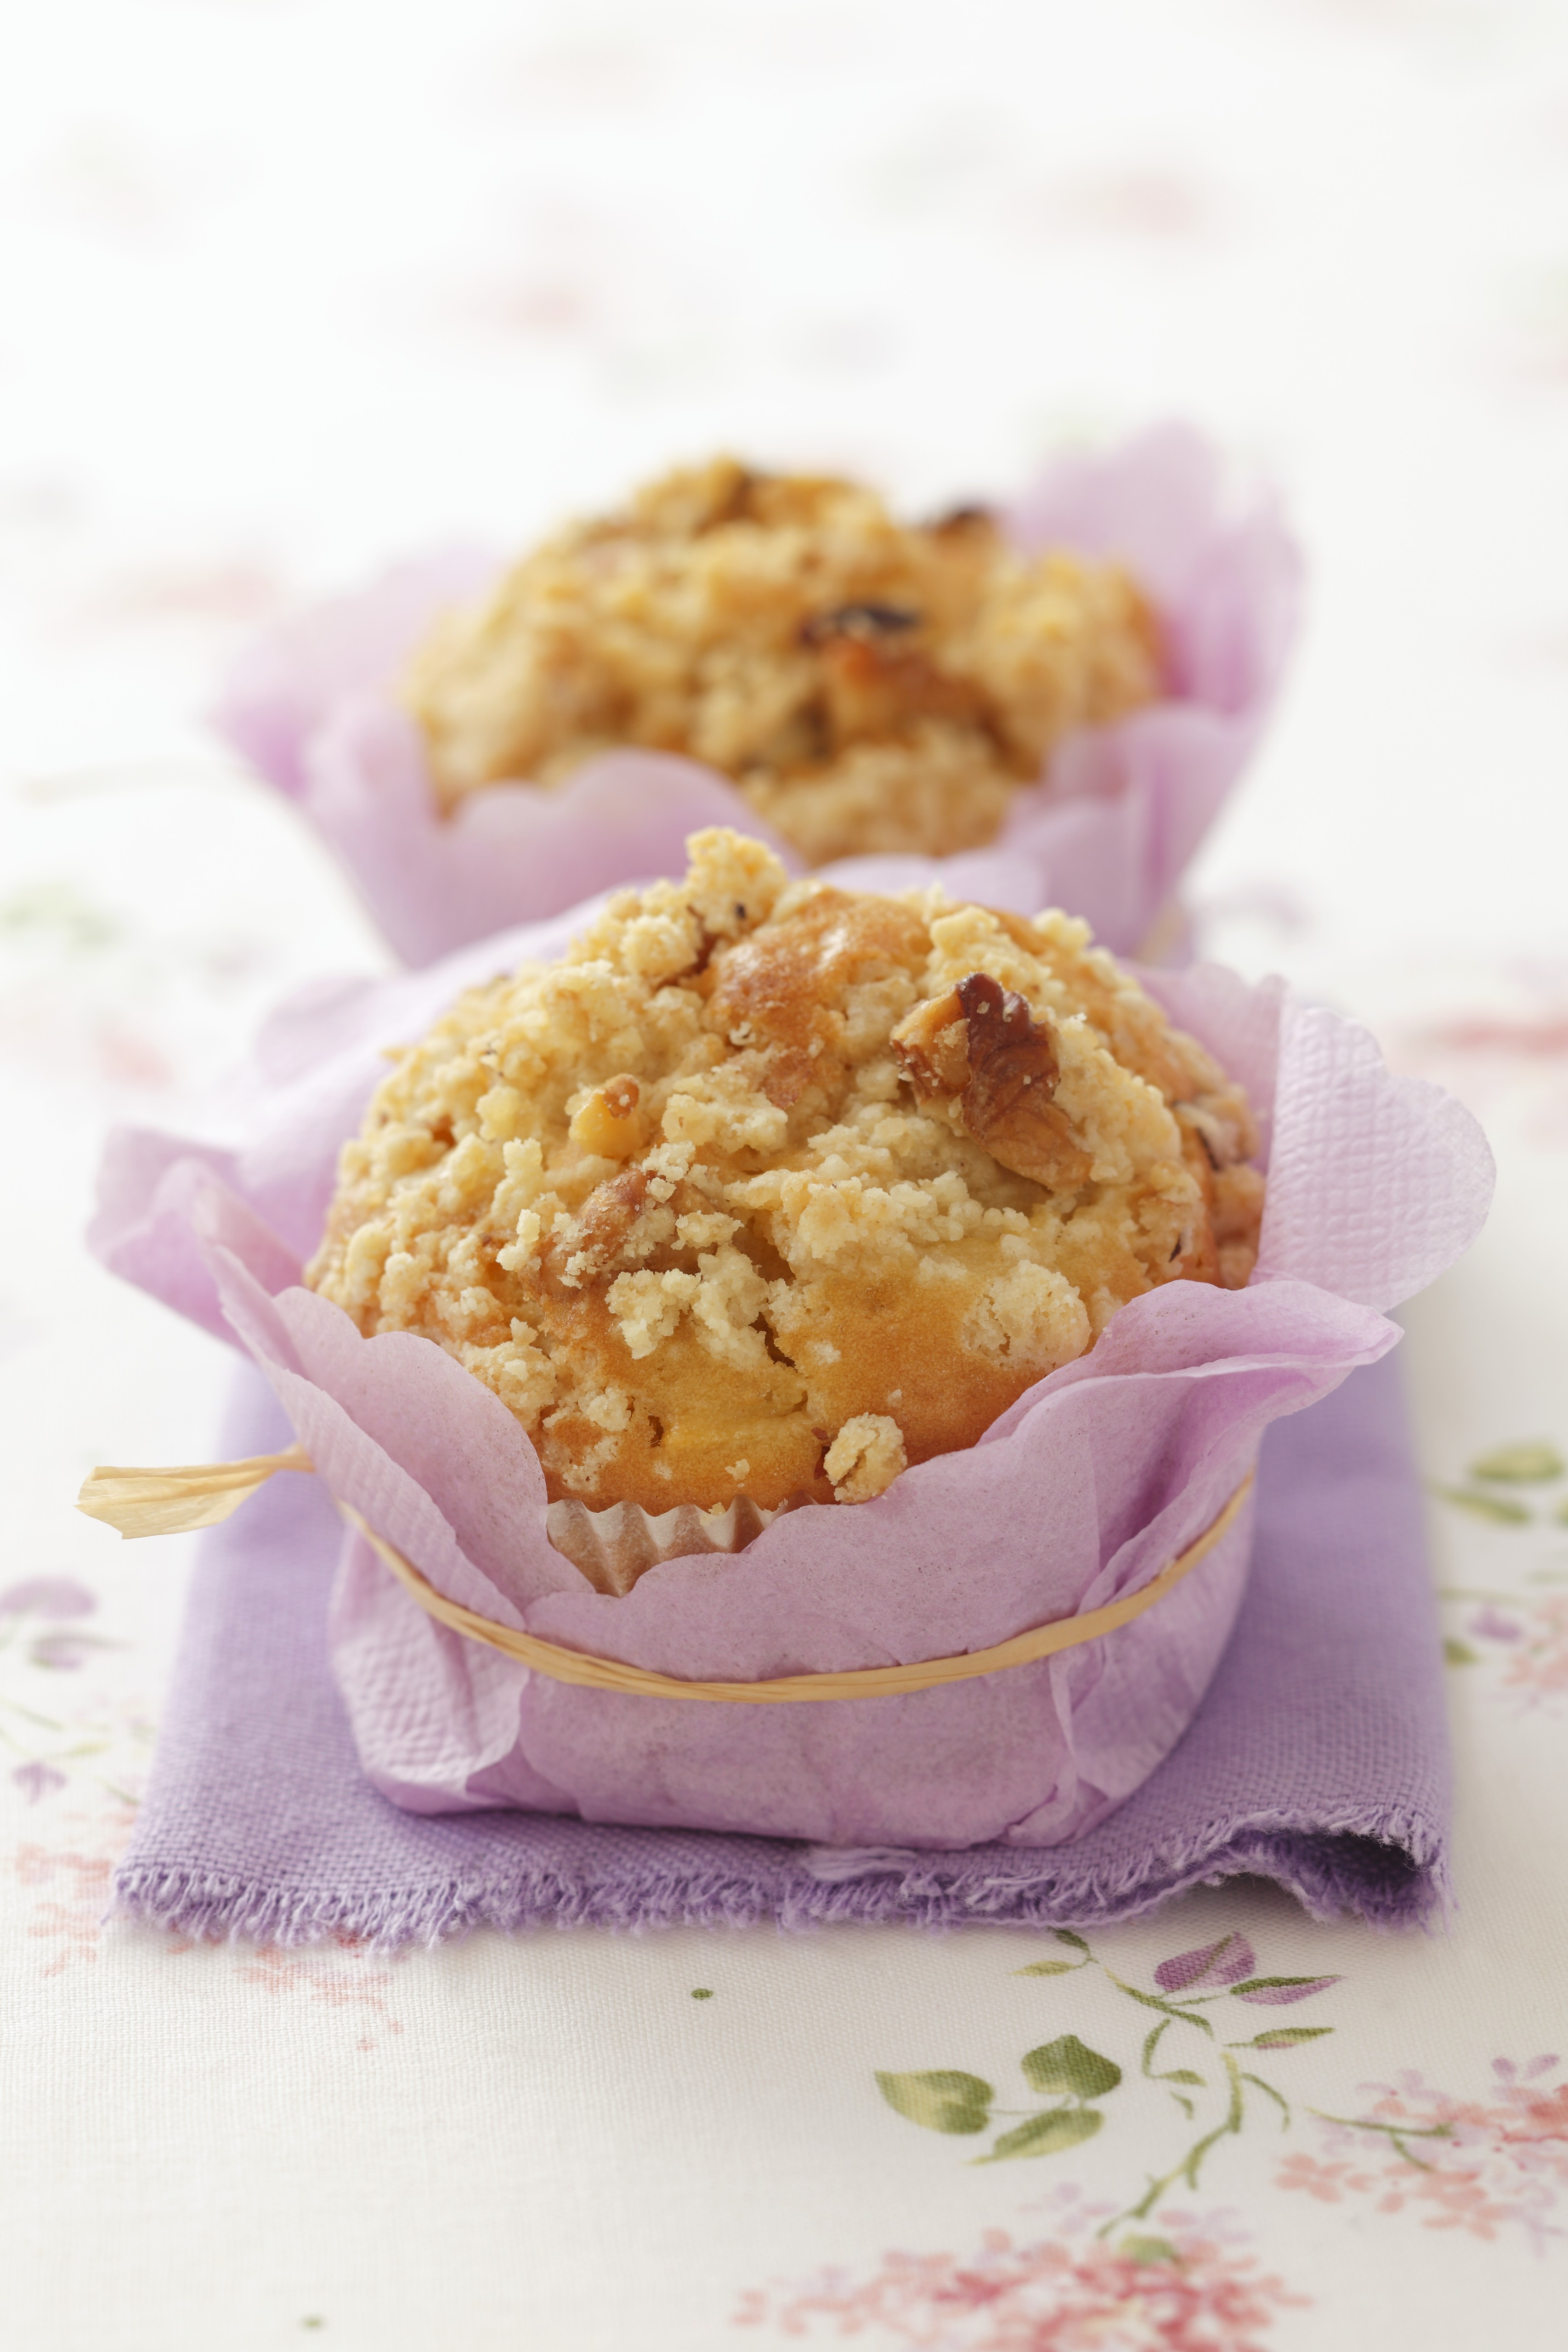 Ricetta Muffin Di Mele.Muffin Alle Mele Ricetta Inglese Agrodolce